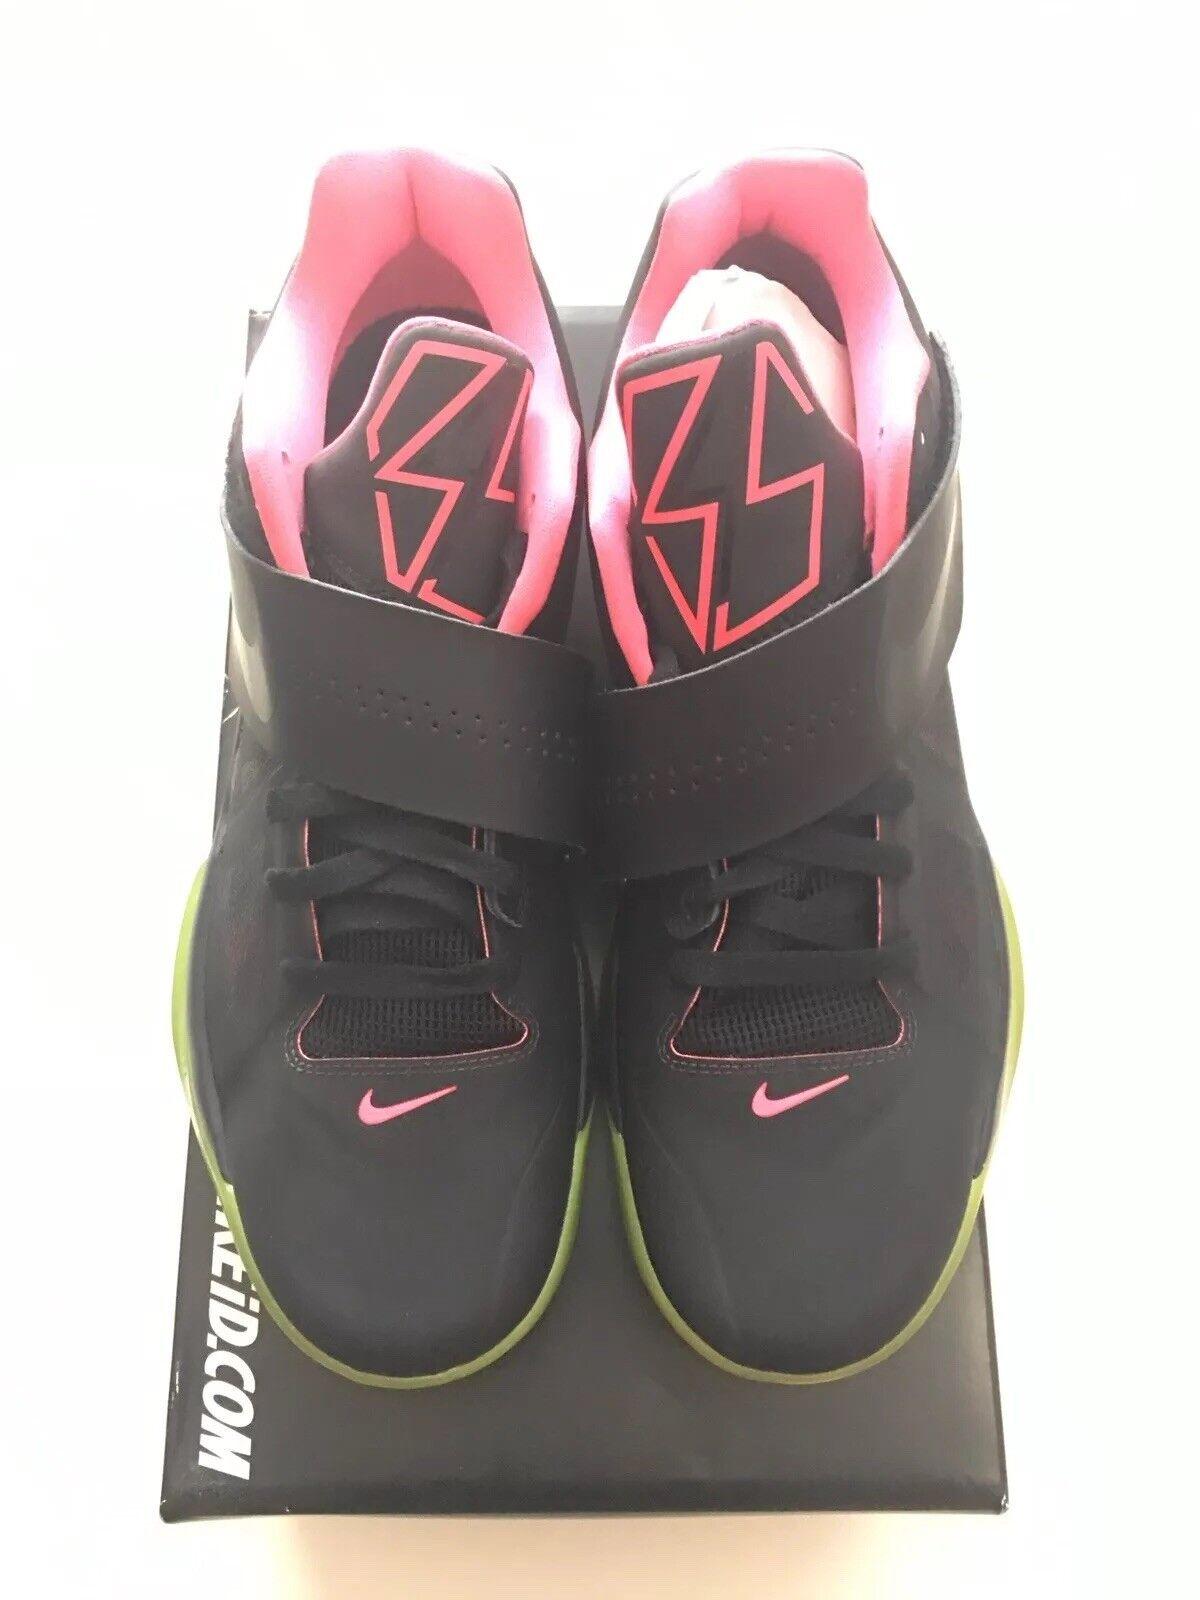 KD 4 Nike iD Yeezy Colorway